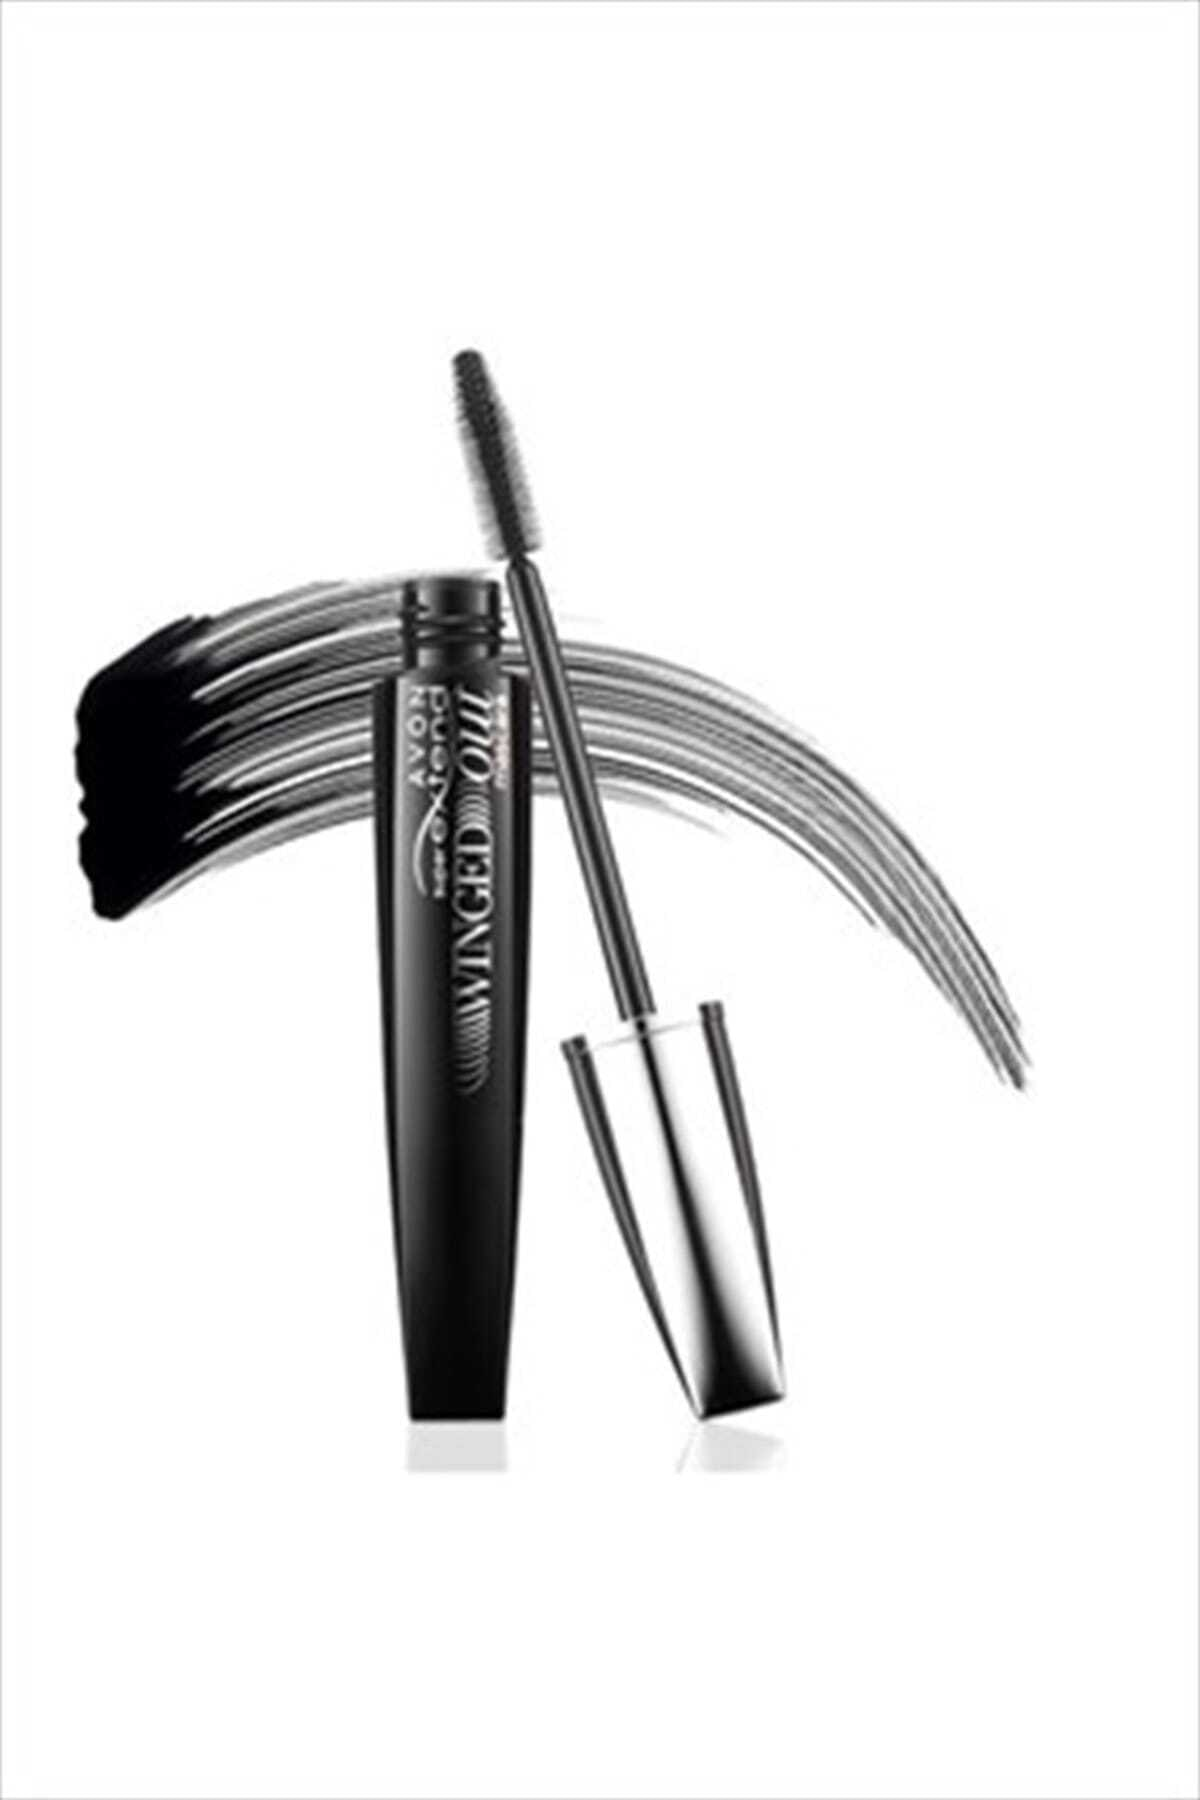 AVON Siyah Maskara - Super Extend Winged Out Mascara Blackest Black 8681298932192 1